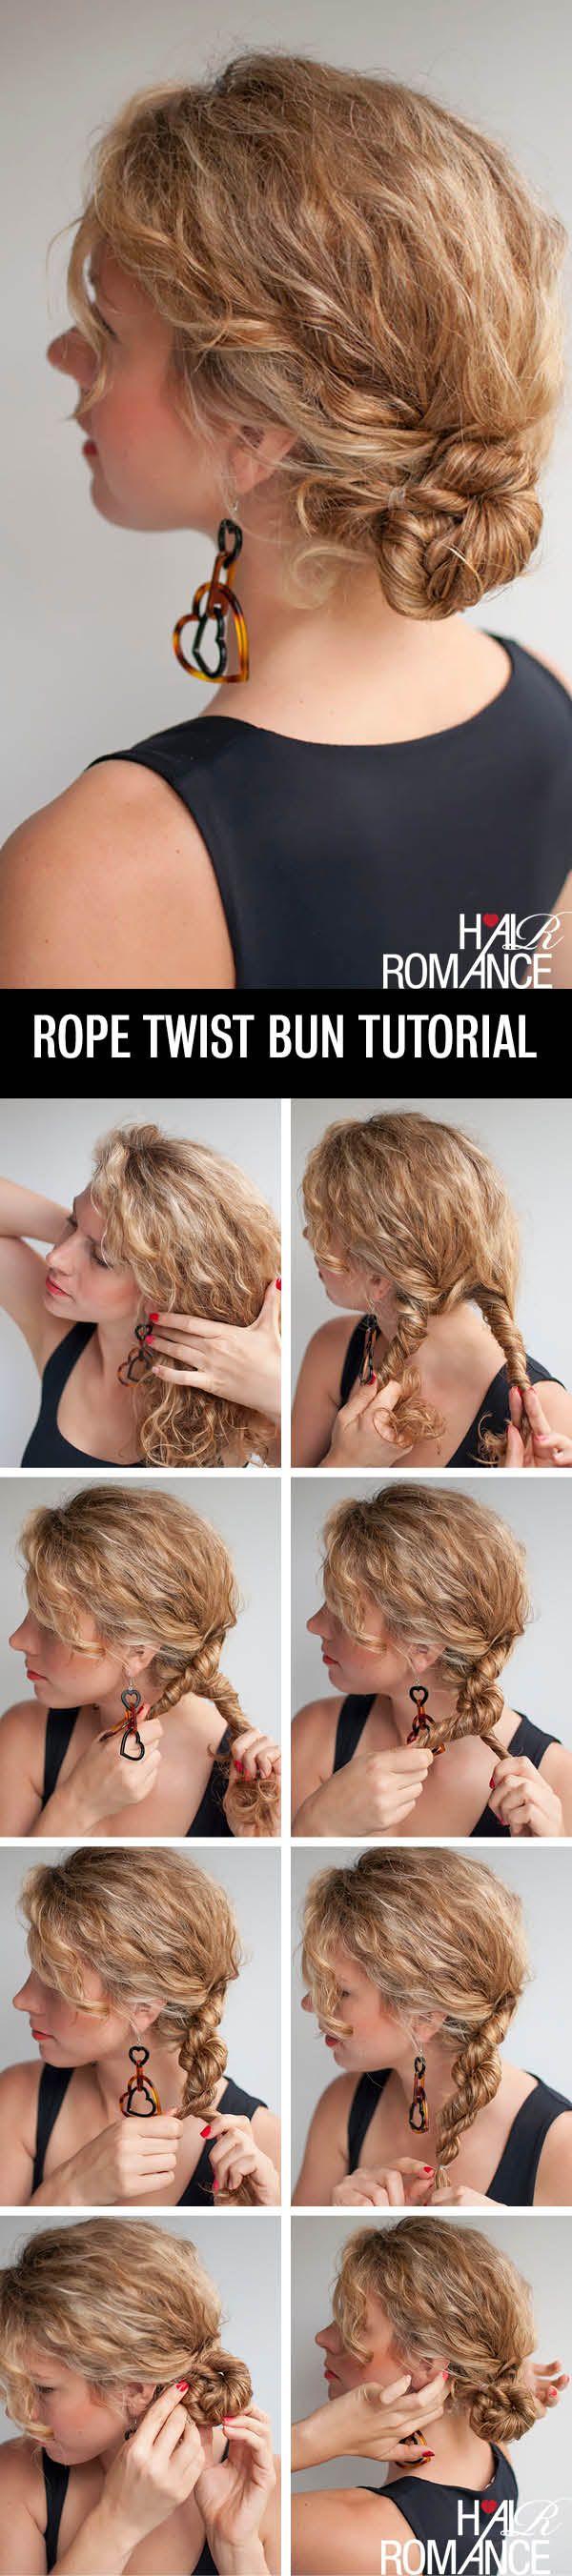 Twist Bun Updo Tutorial for Curly Hair